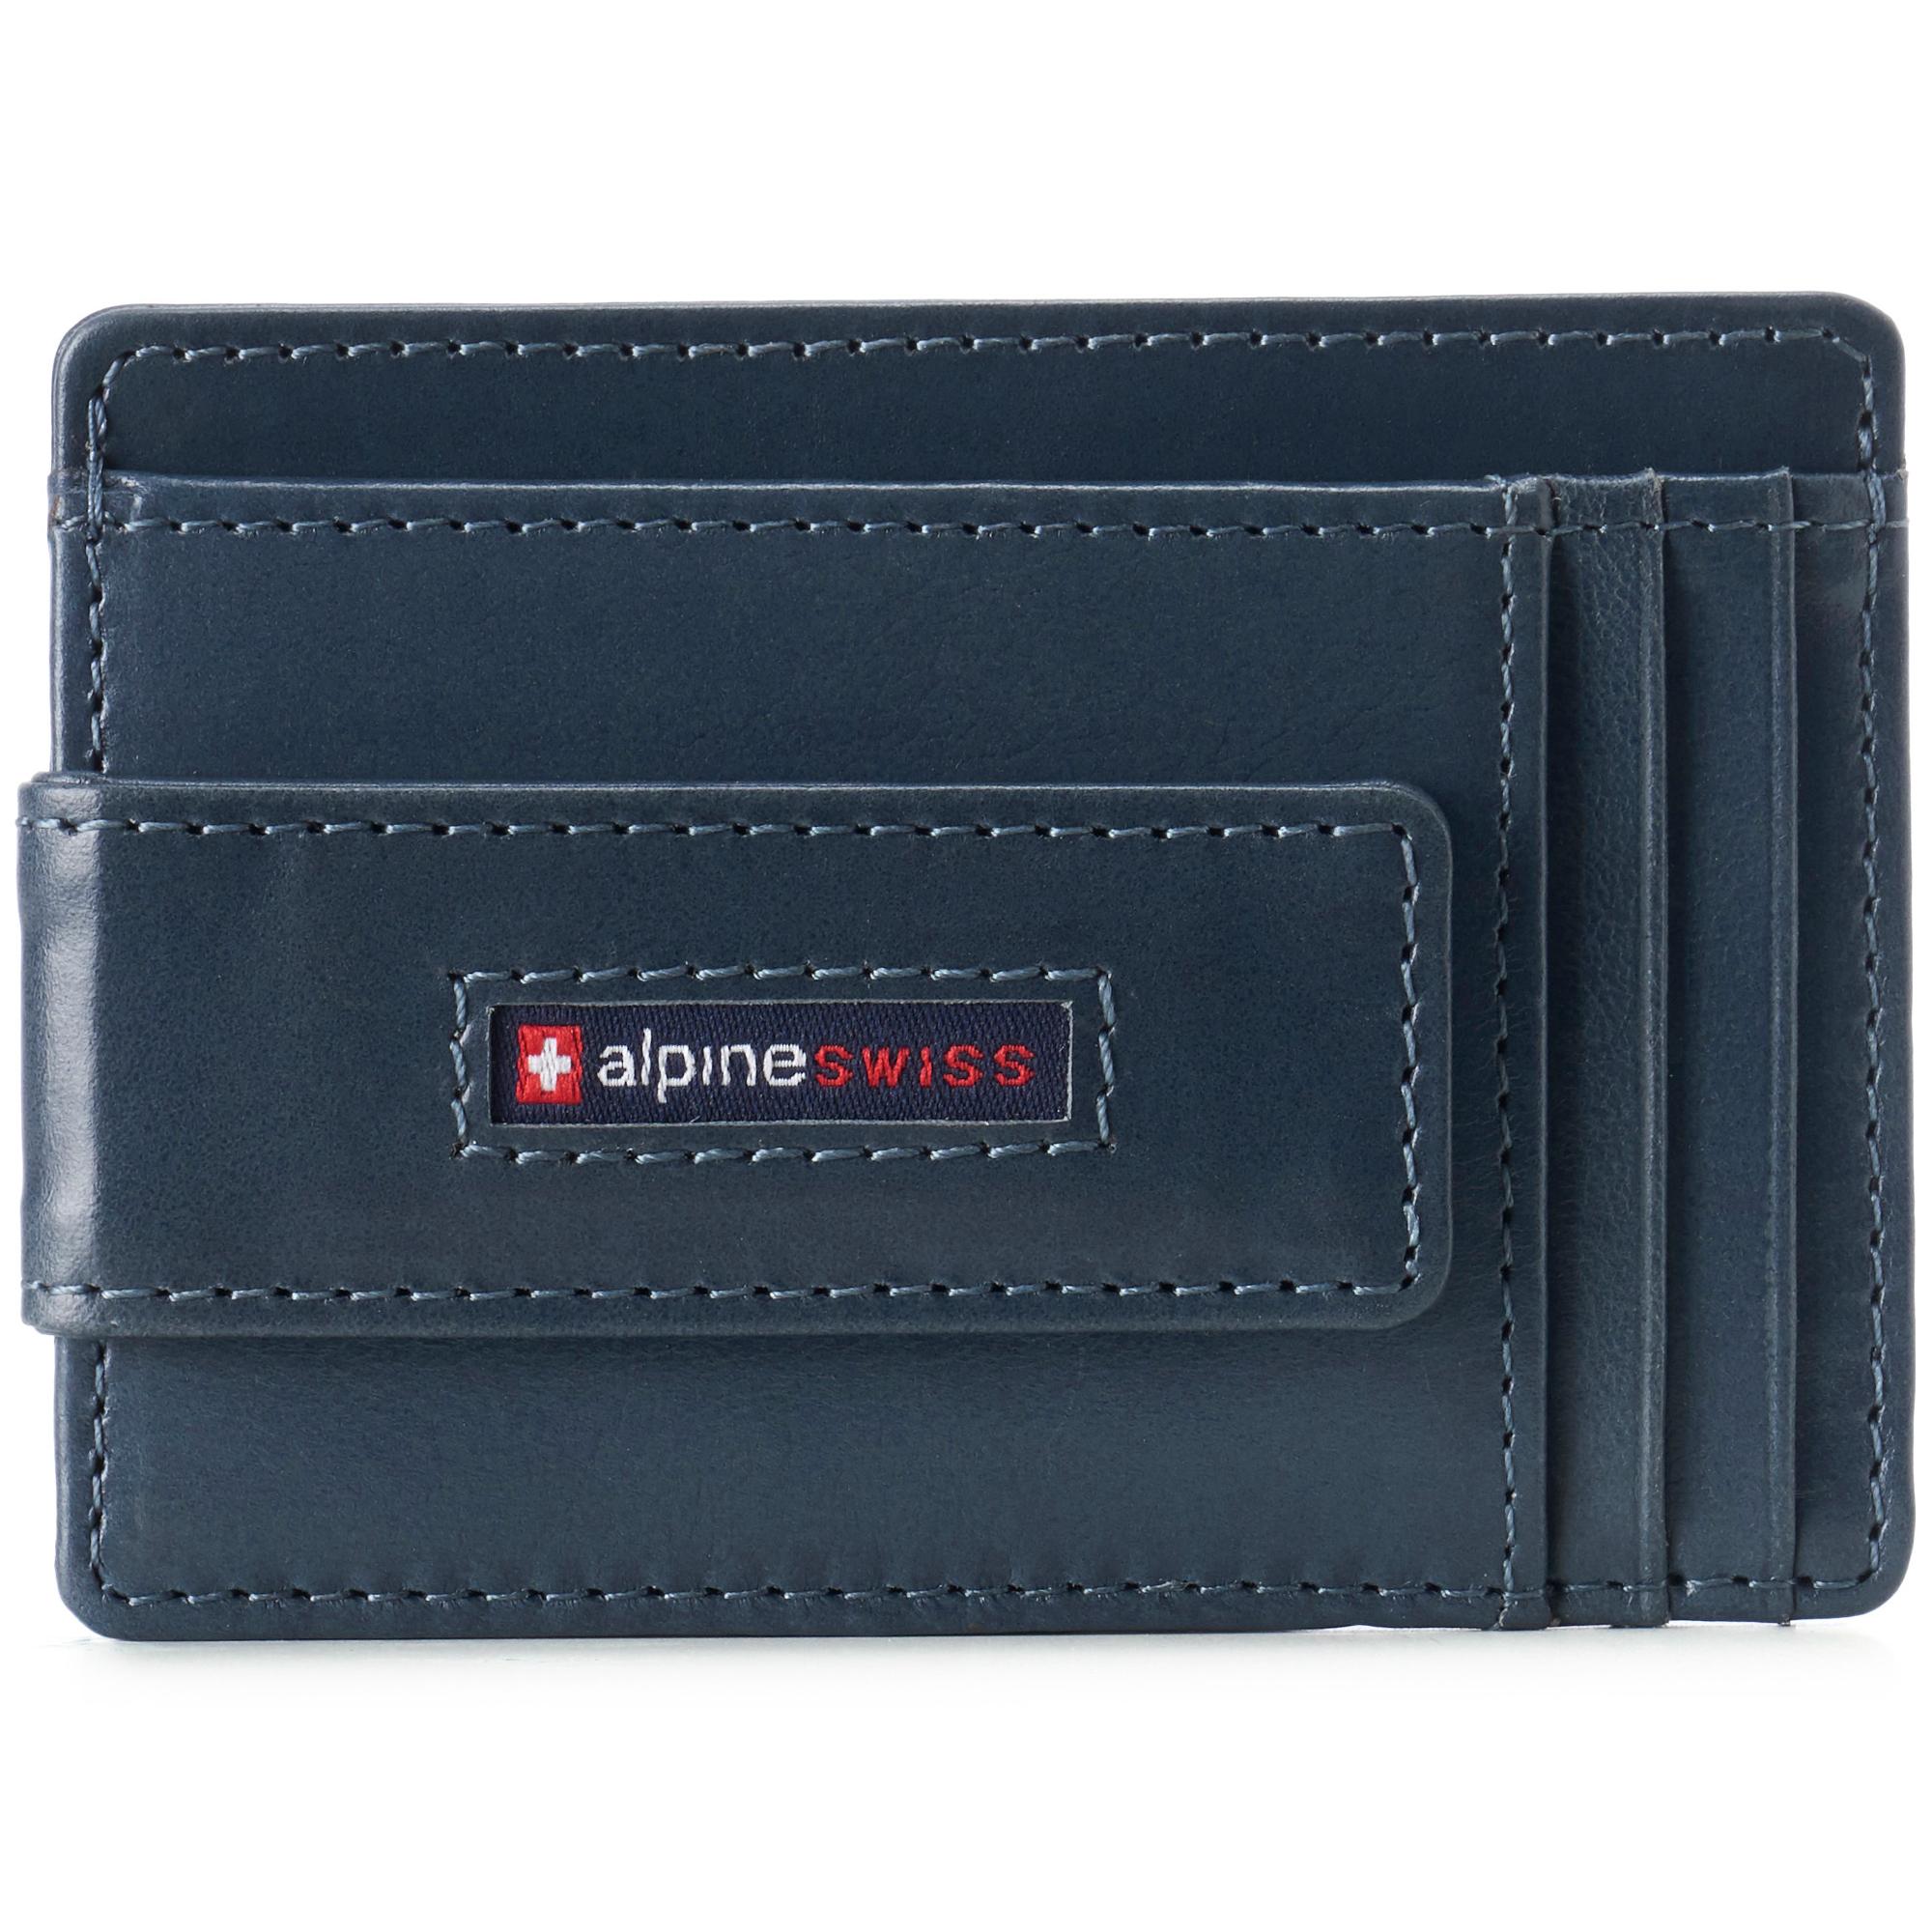 thumbnail 60 - Alpine Swiss Mens RFID Safe Slim Magnetic Money Clip Leather Front Pocket Wallet